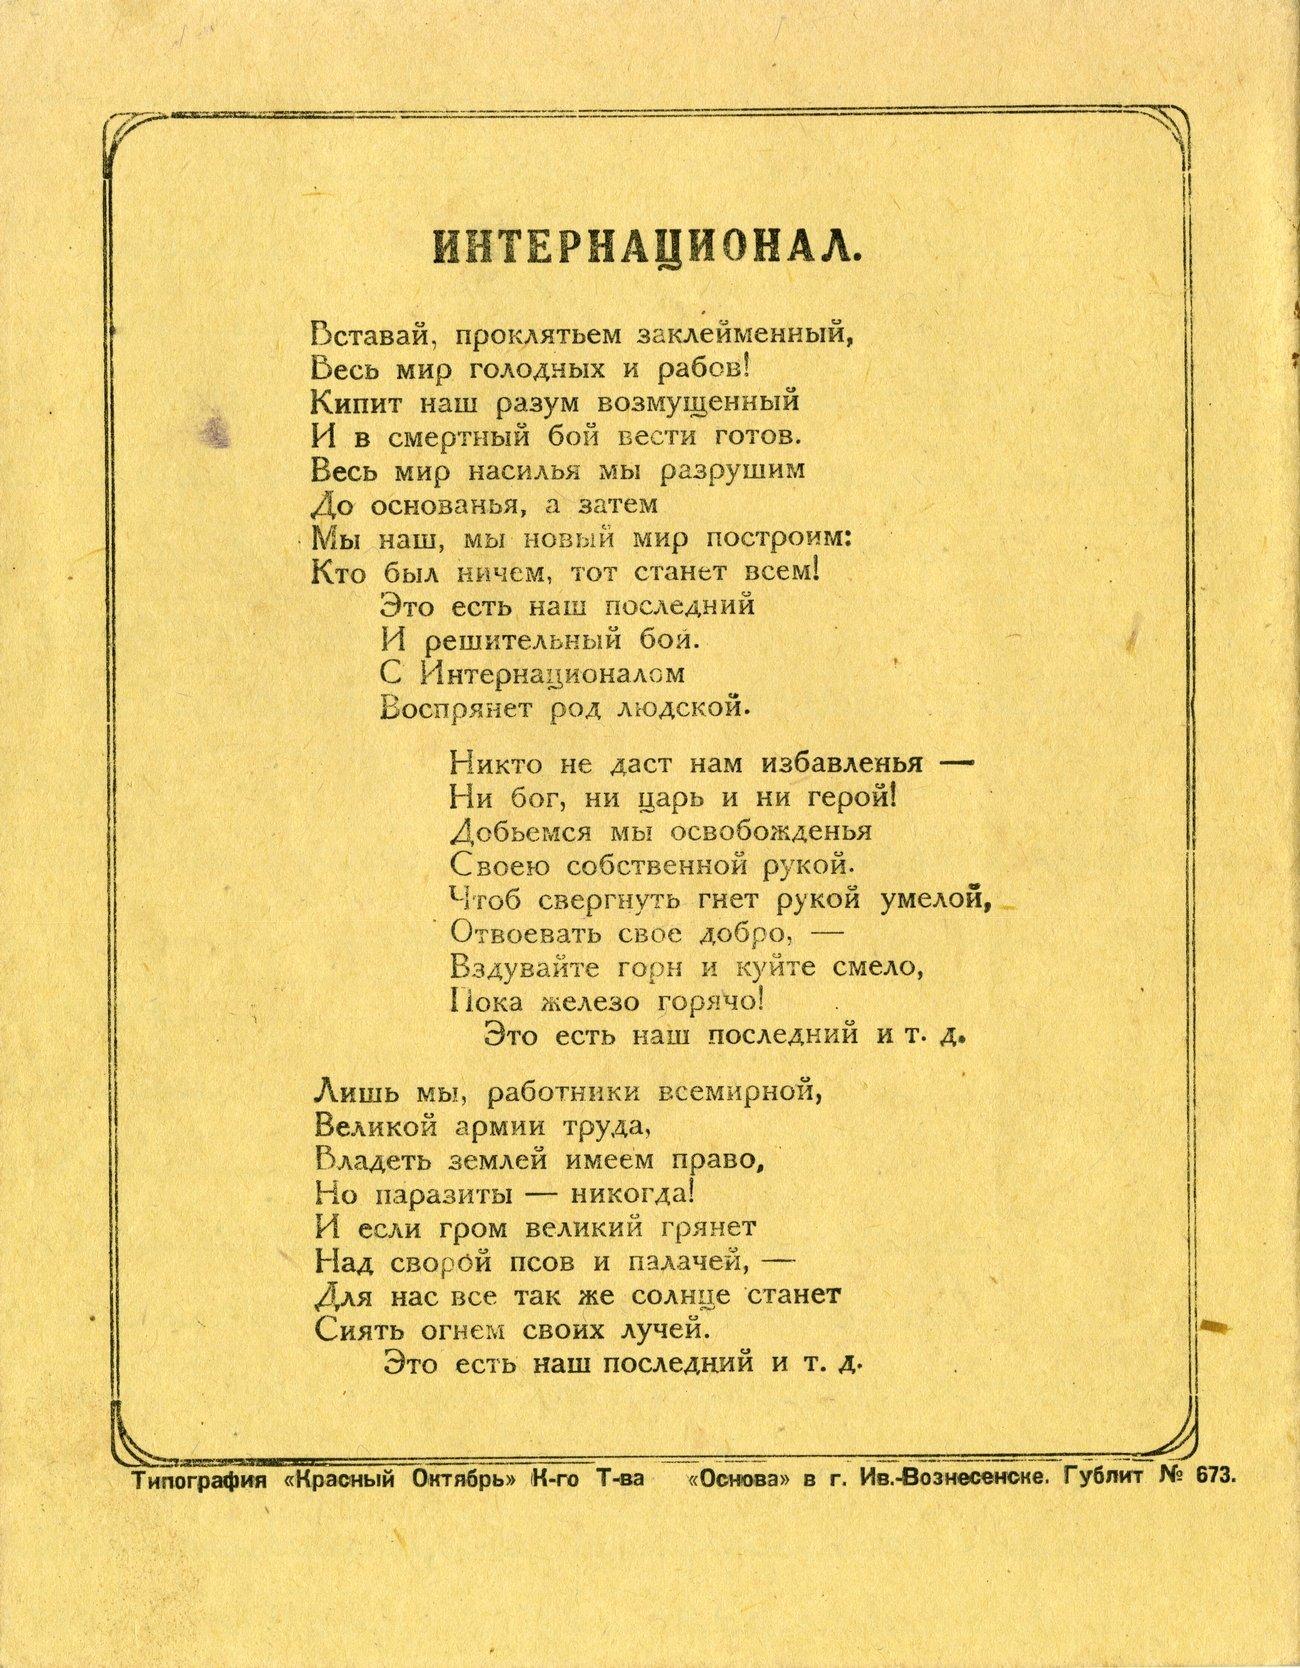 Тетрадь СССР 7 оборот